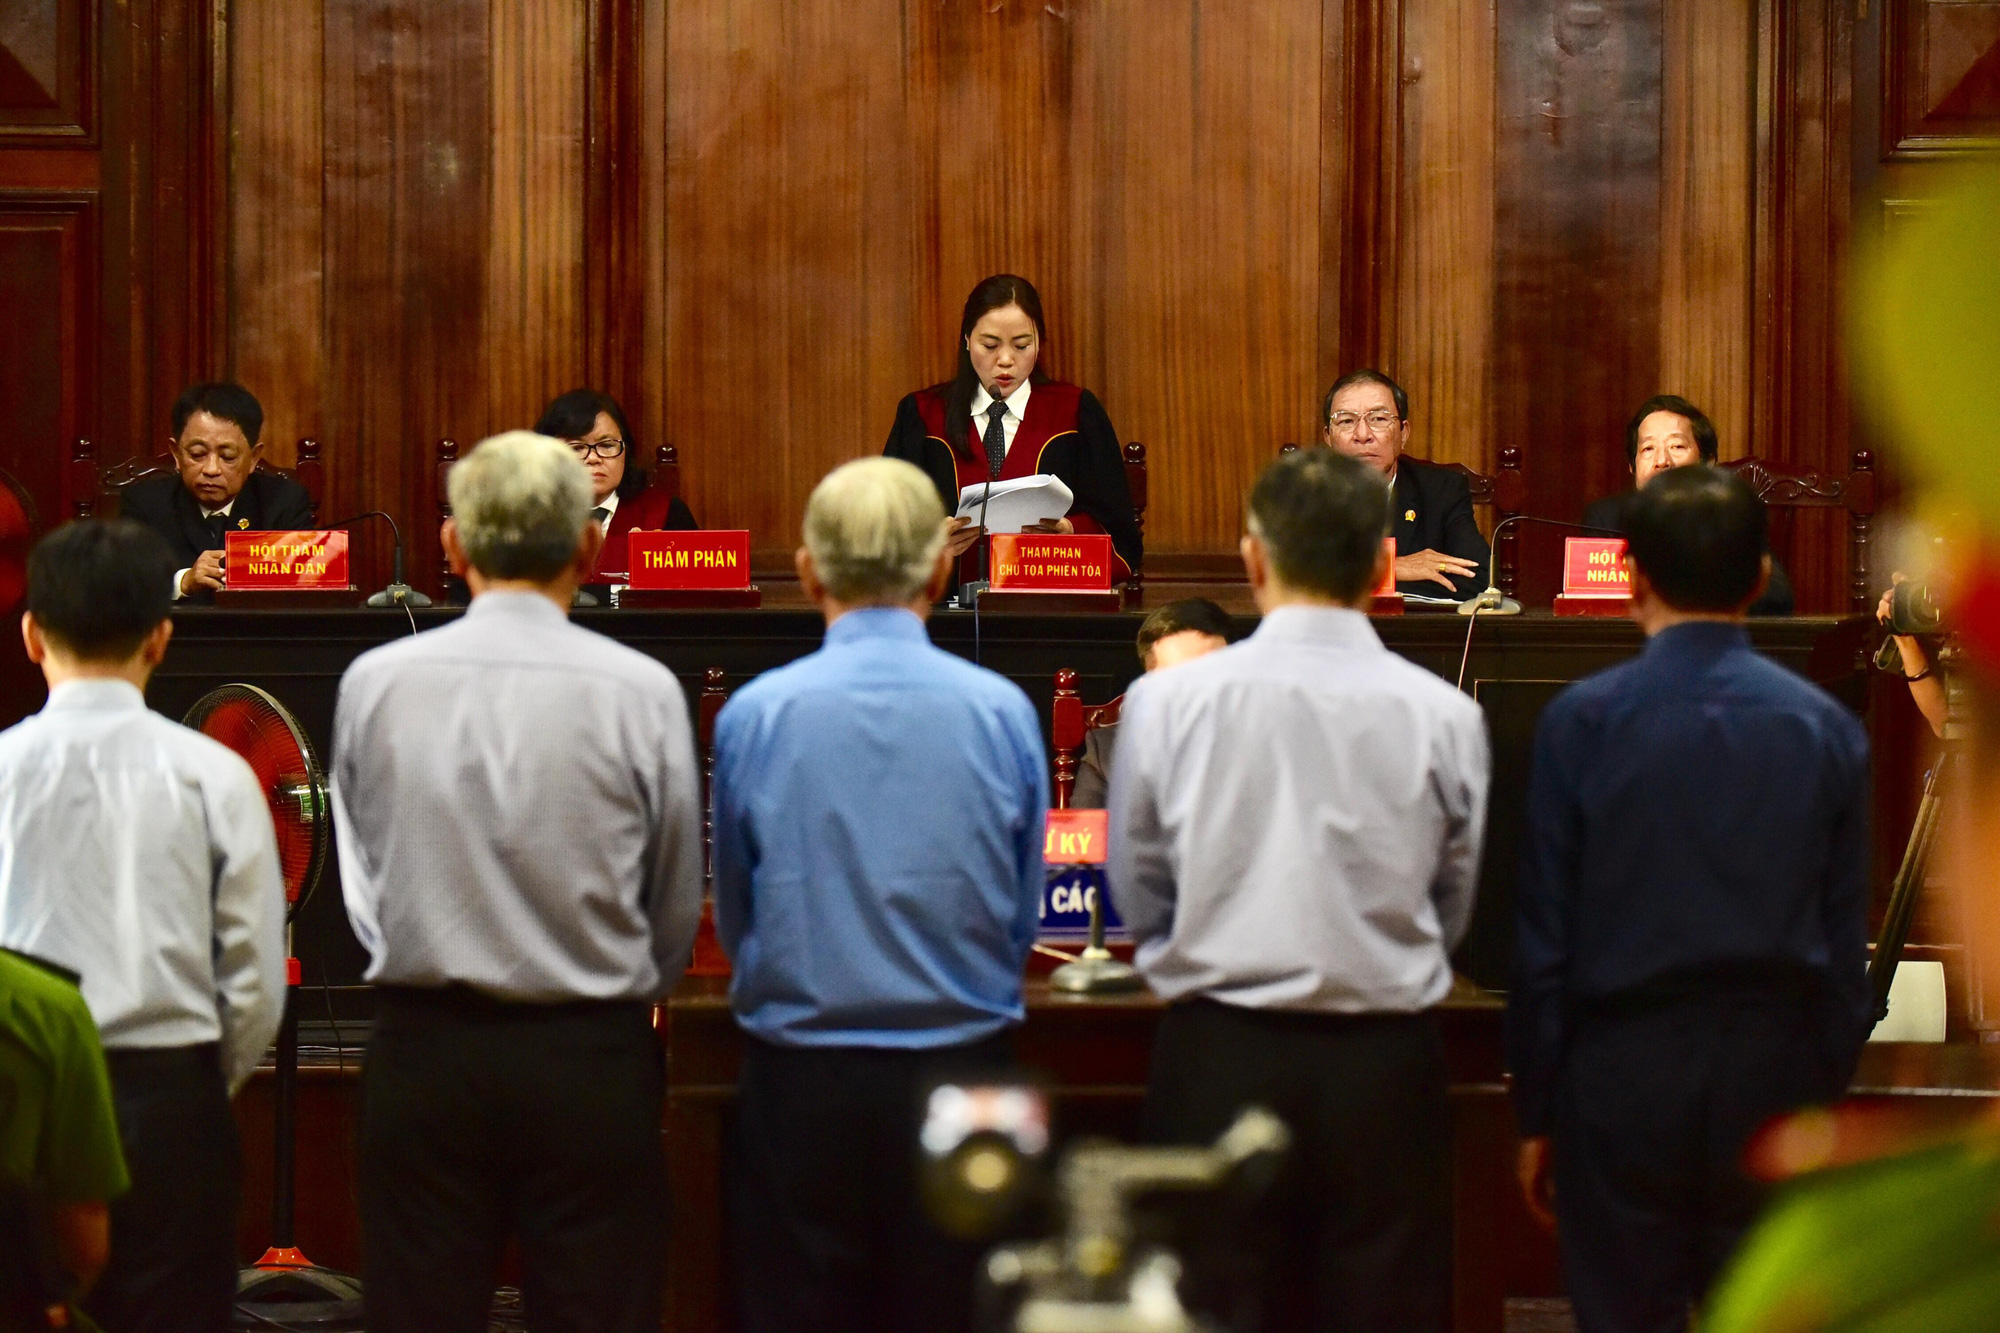 Ho Chi Minh City ex-vice chairman jailed for land mismanagement